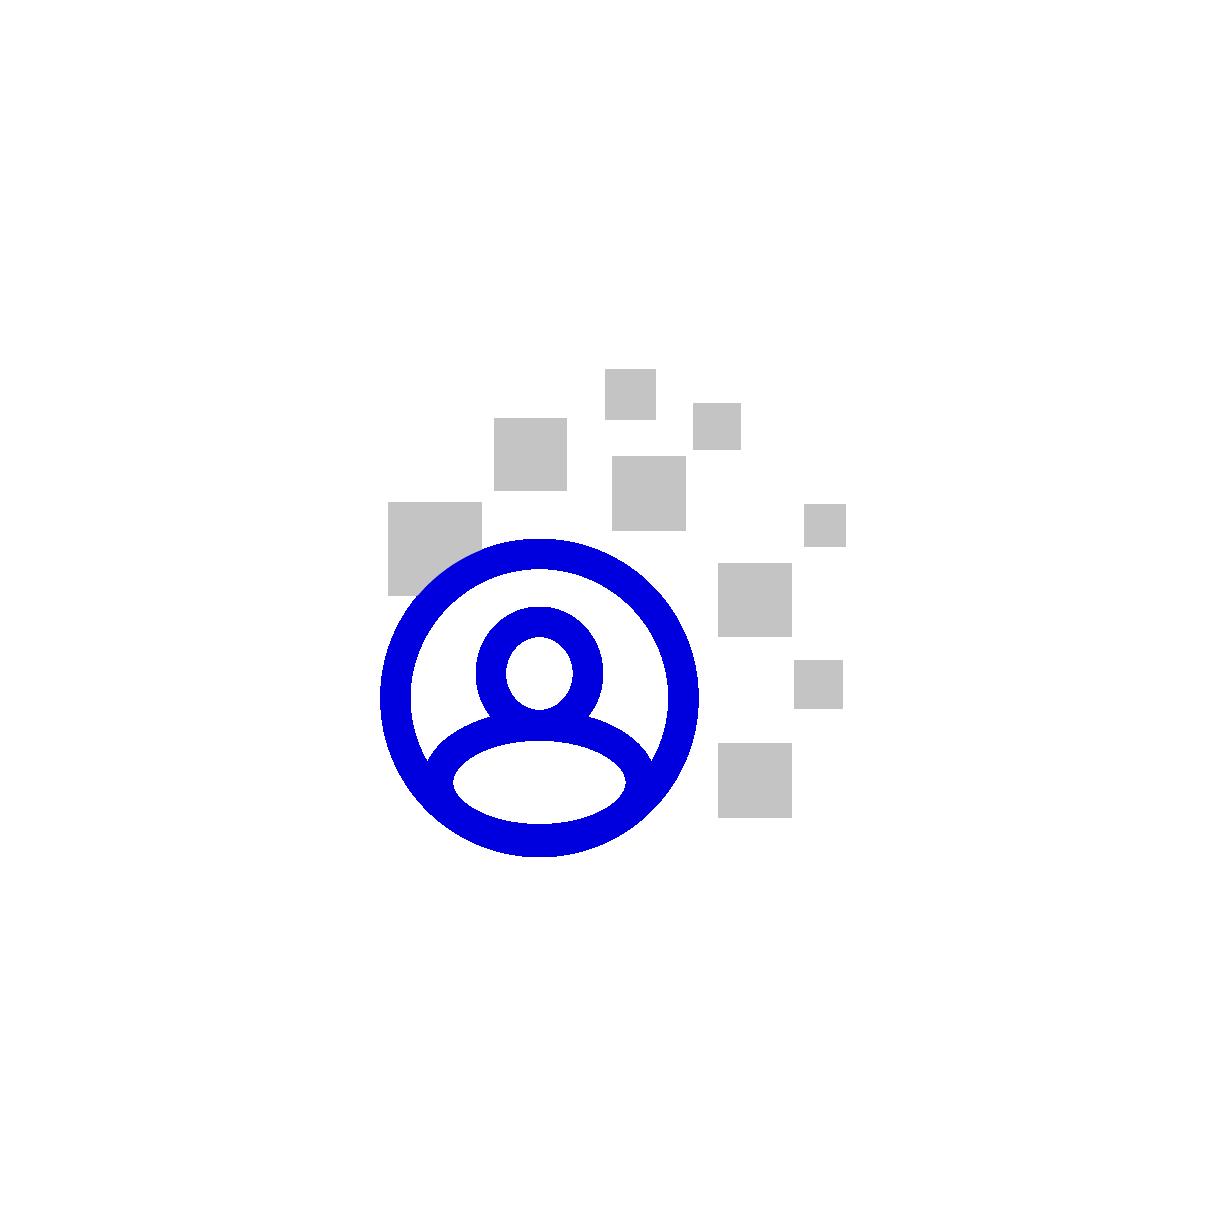 2016 Identite Digitale Rvb 1